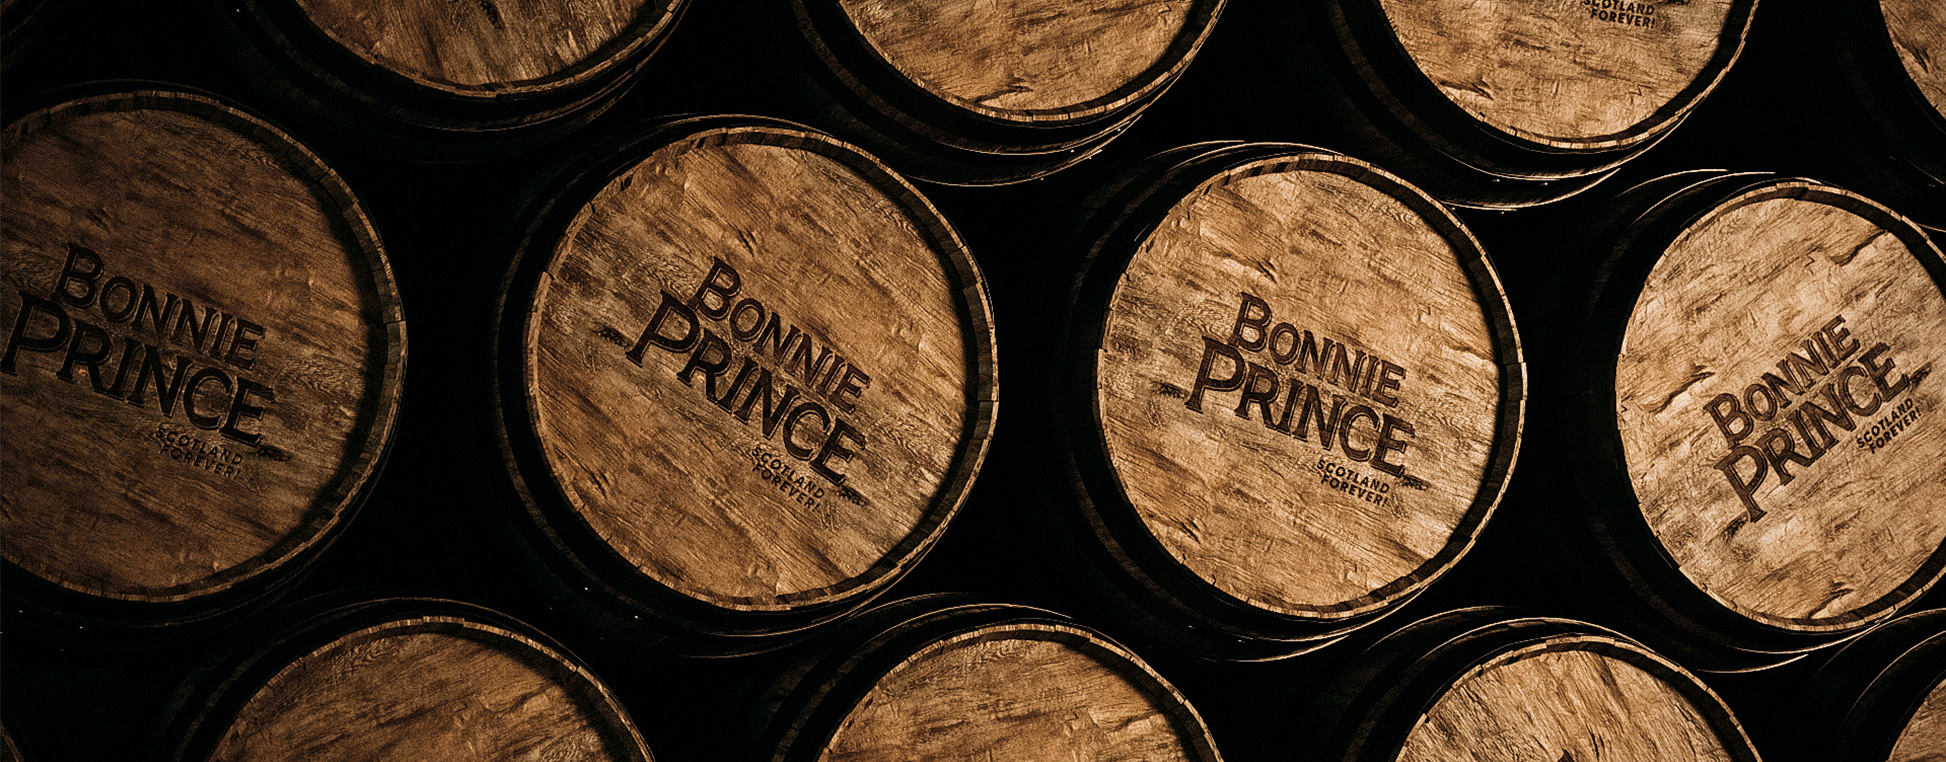 Bonnie Prince image